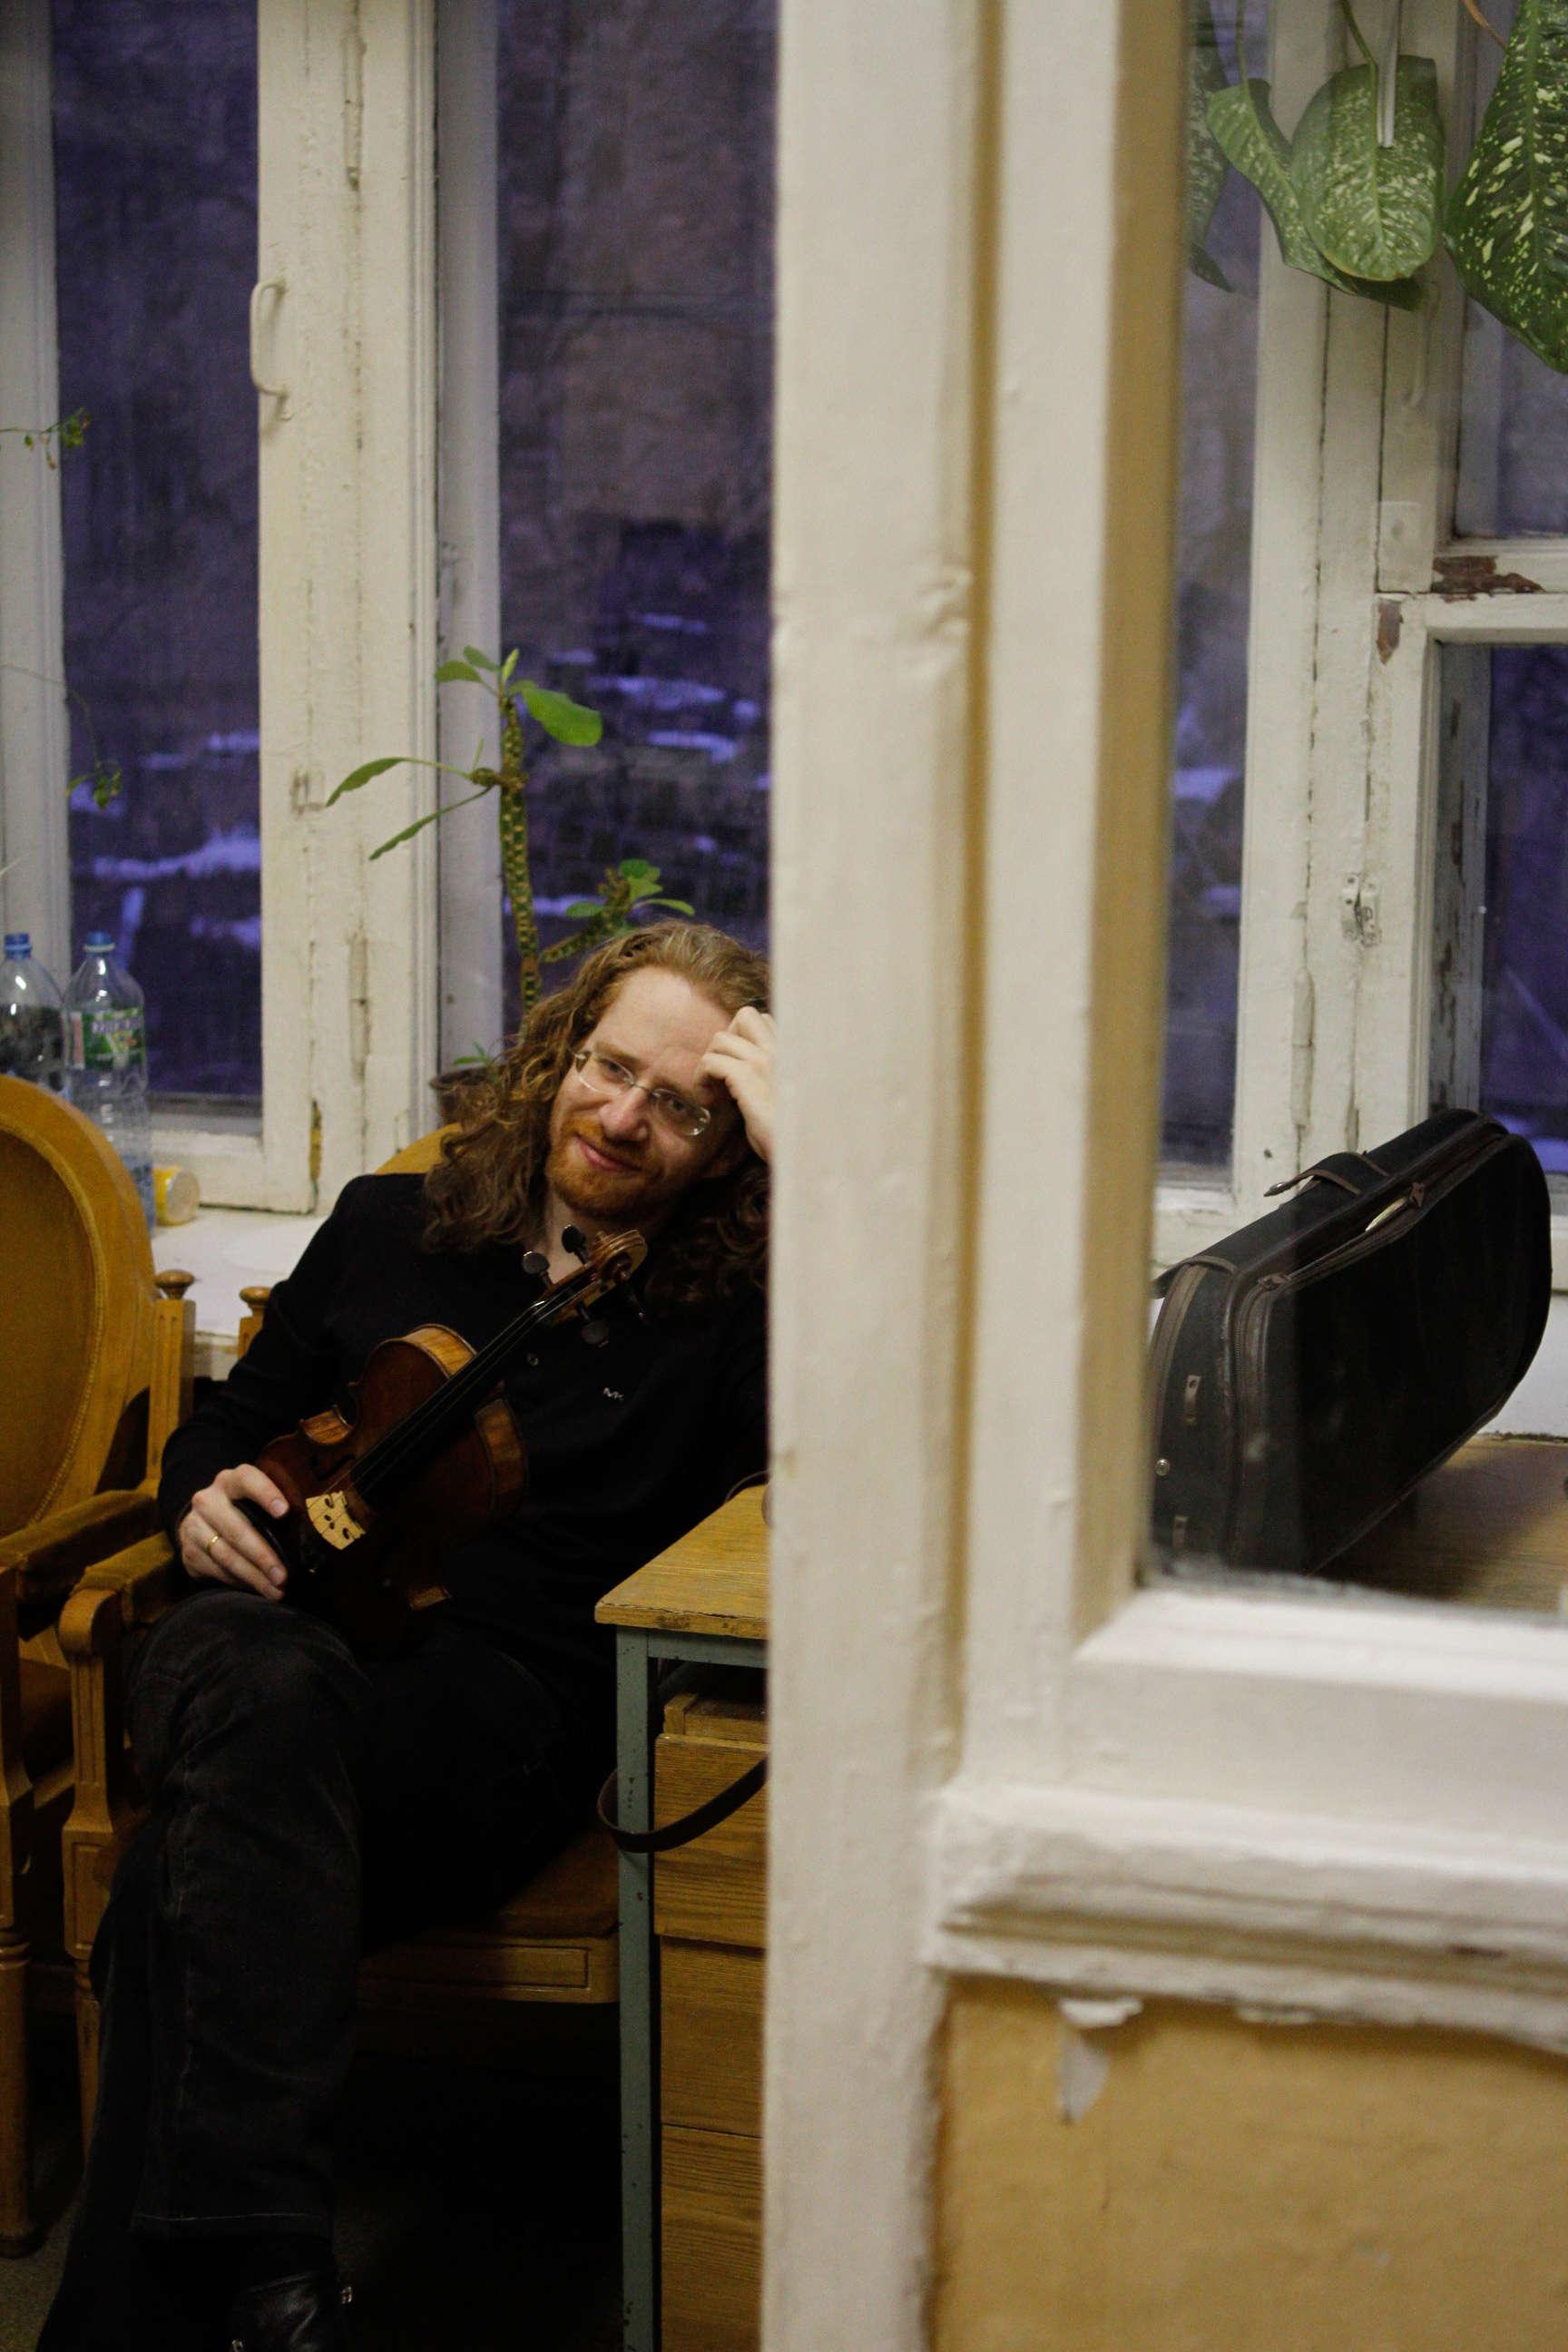 (c) Dmitri Yaroslavtsev